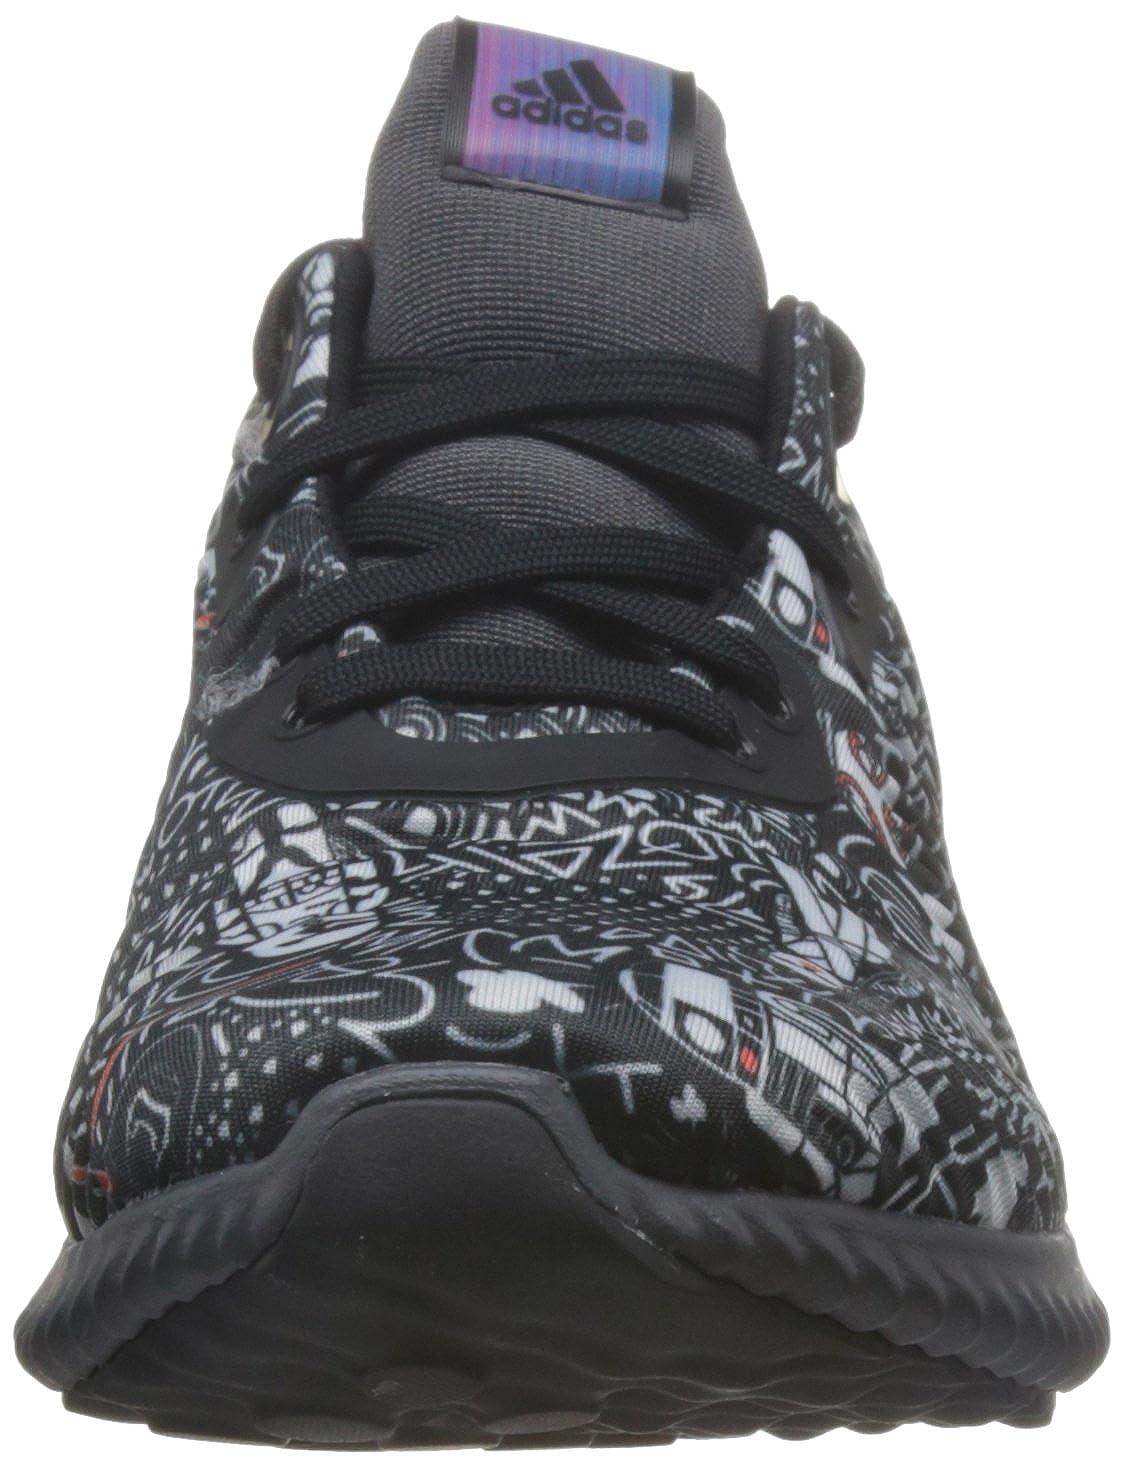 reputable site e8dfe 30672 ... Adidas Alphabounce Starwars J, de Zapatillas de J, Deporte para Mujer  ba99f0 ...